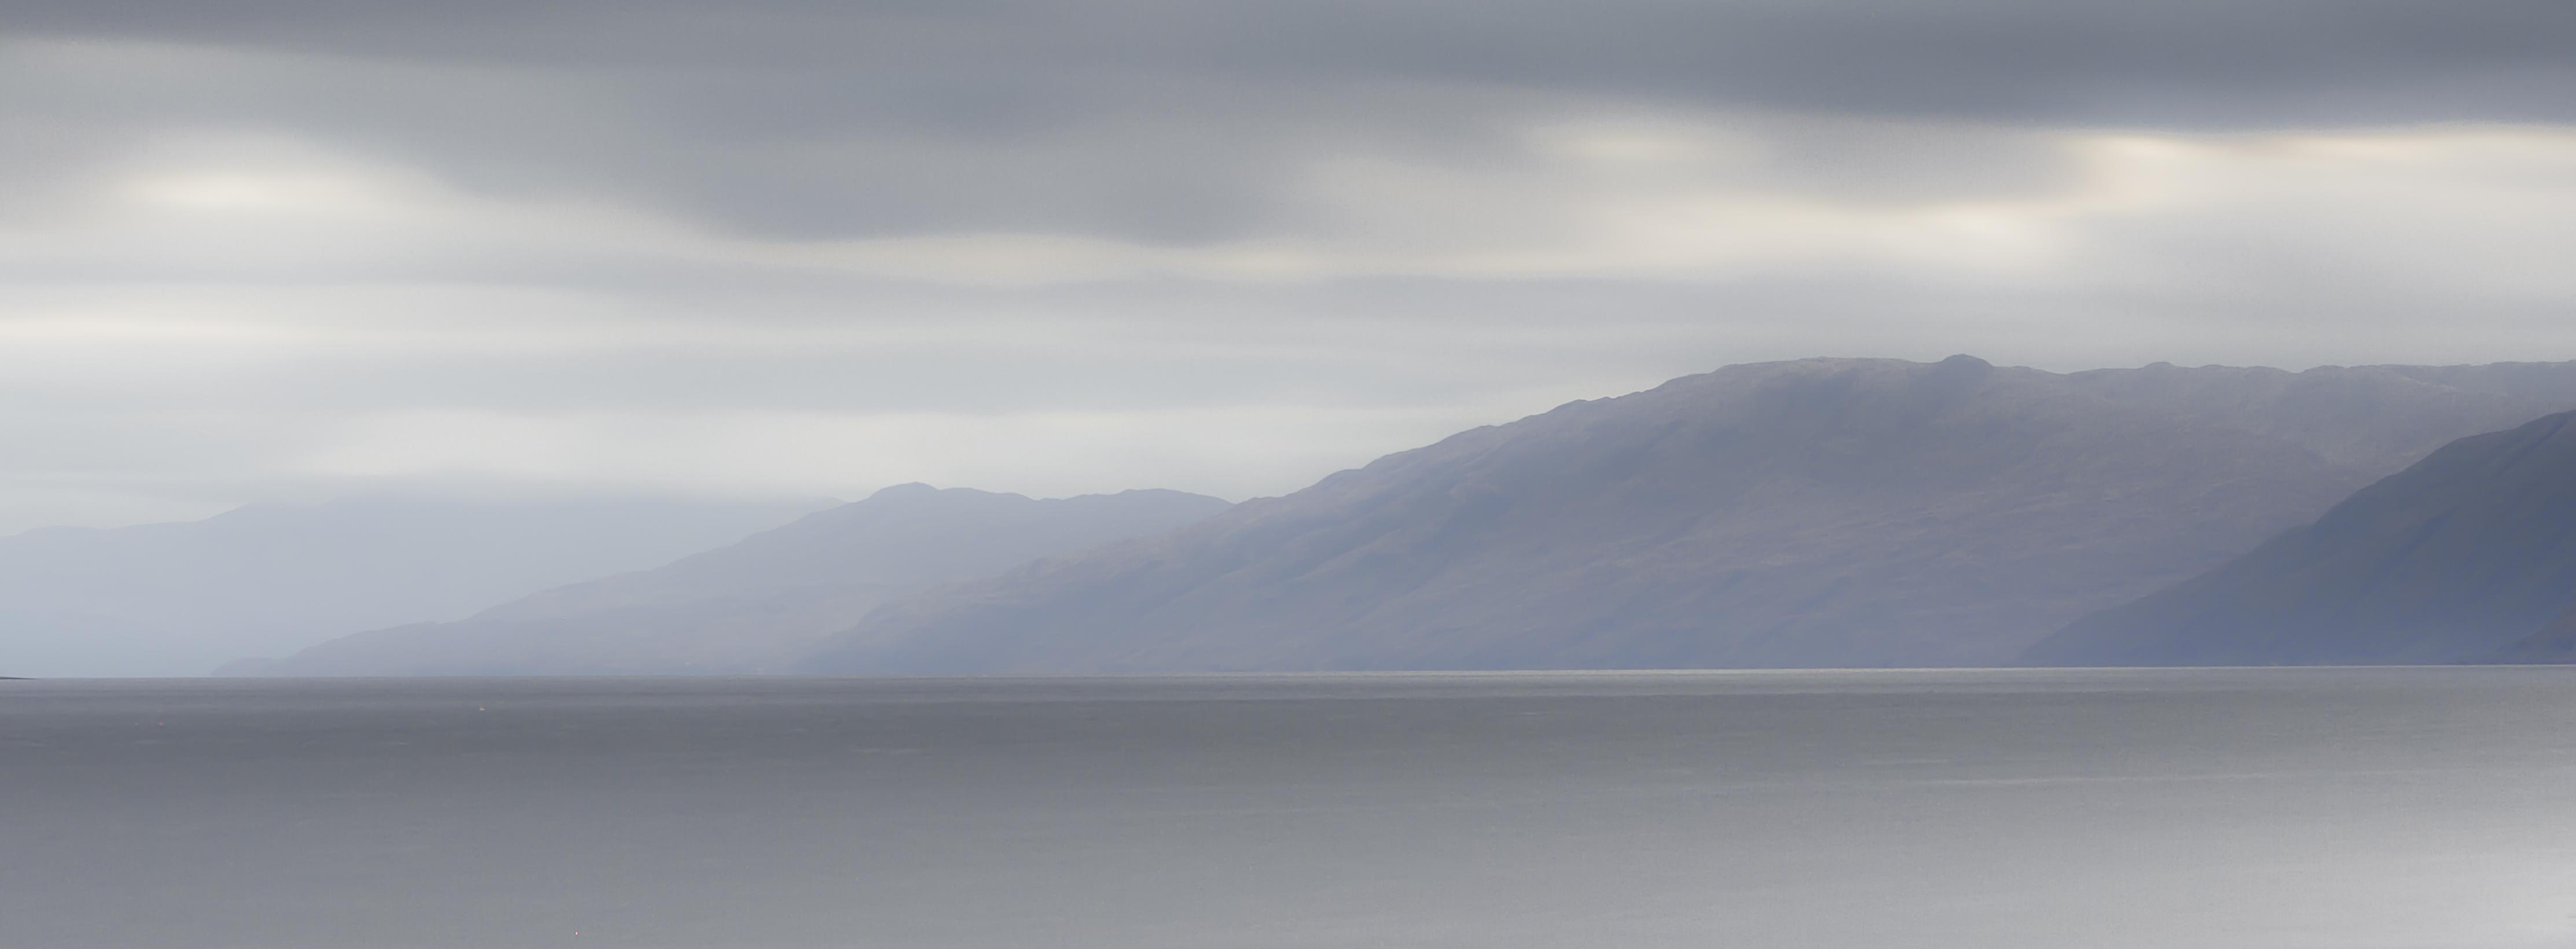 Loch Linnhe Pano